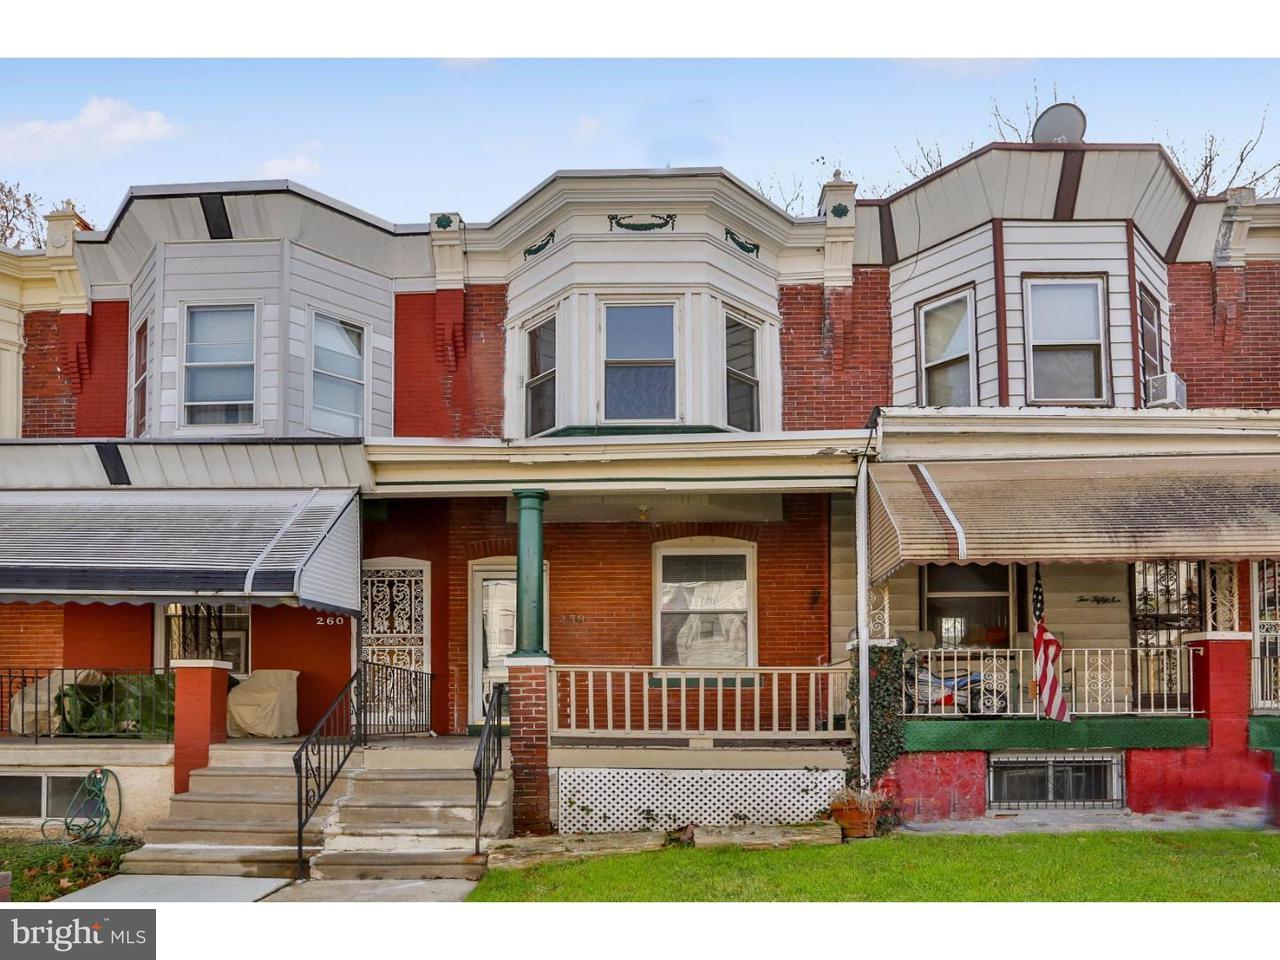 258 E Slocum Philadelphia , PA 19119